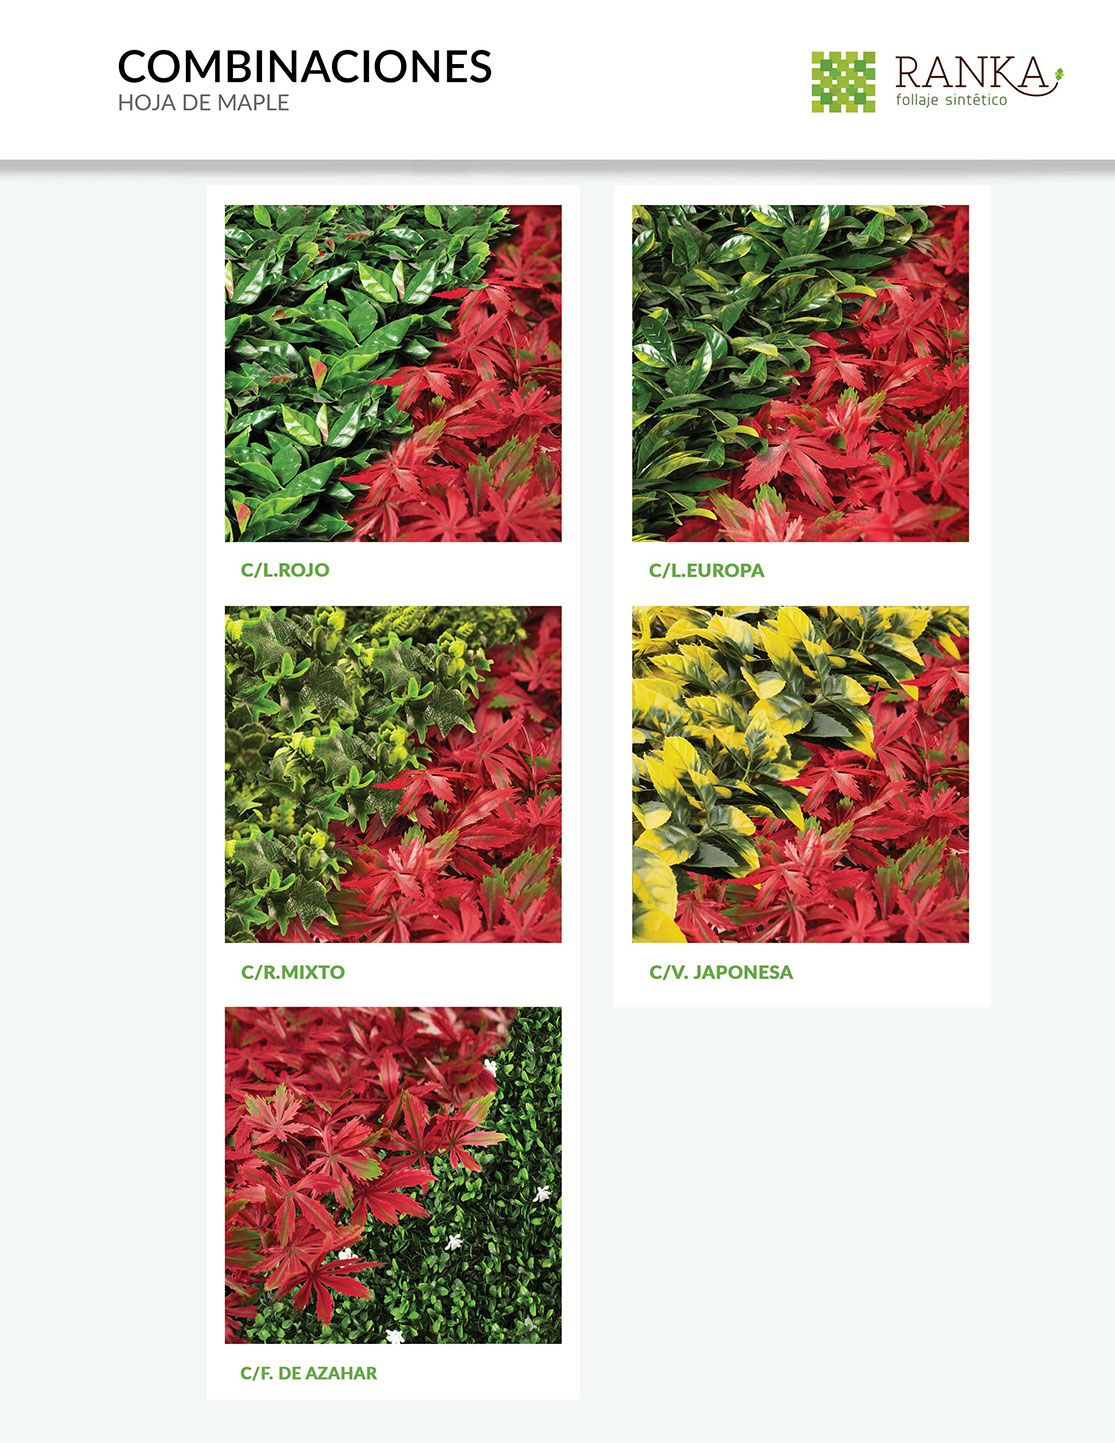 Catalogo ranka follaje artificial enredaderas - Plantas artificiales ...